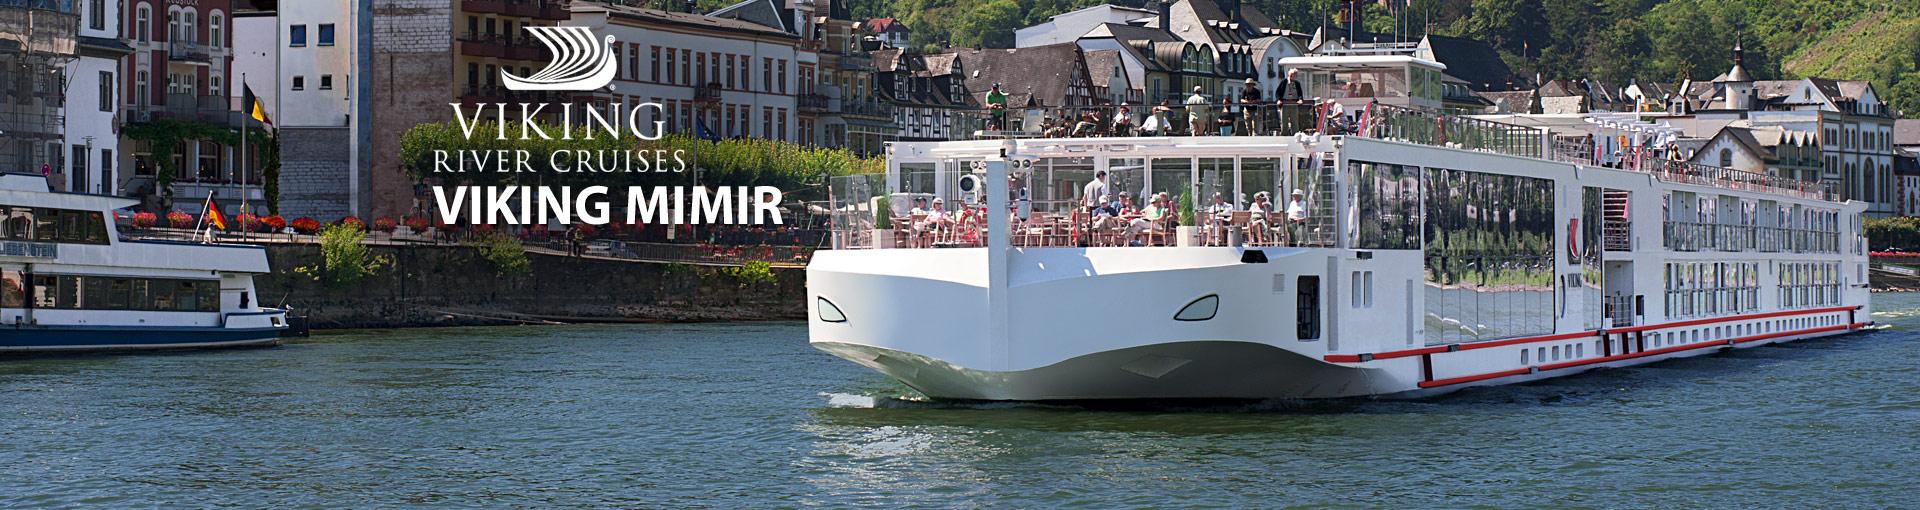 Viking River Viking Mimir river cruise ship